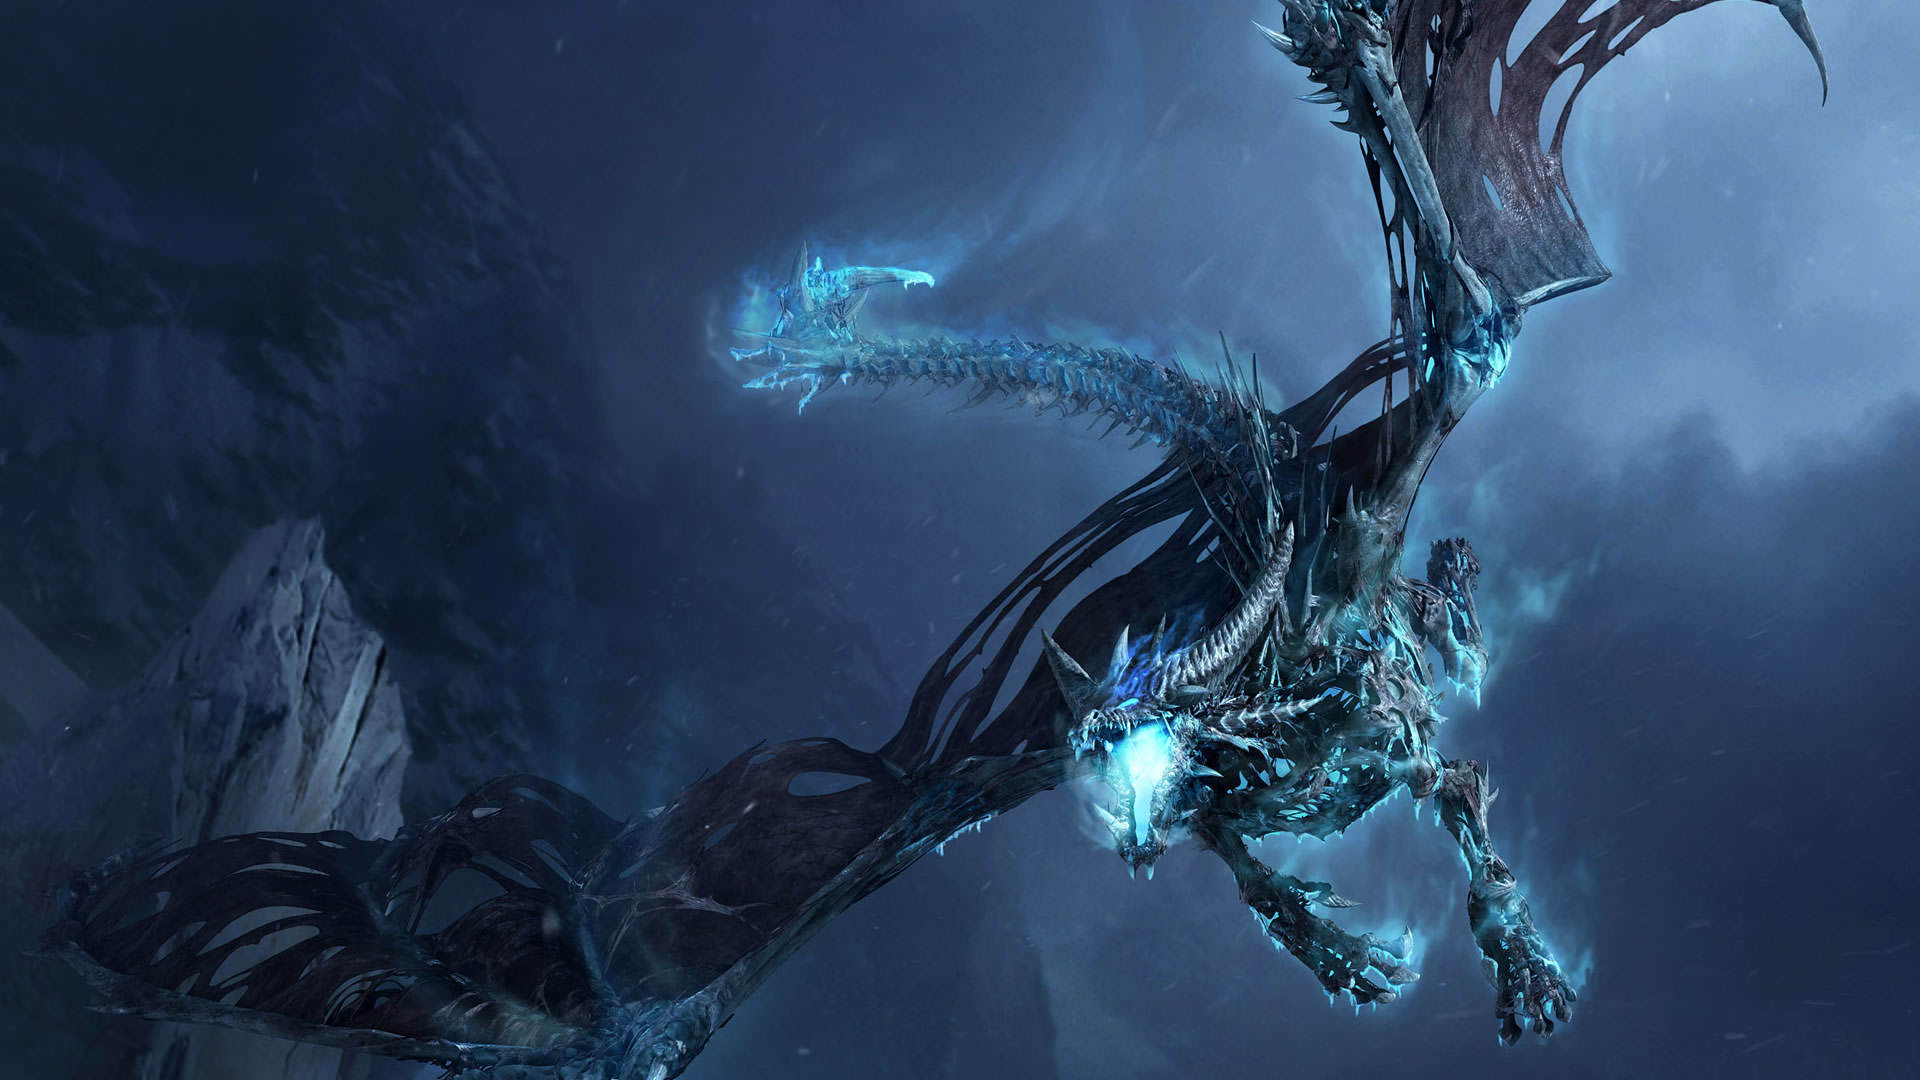 Dragon Death Cool After Art Digital wallpapers HD   166486 1920x1080